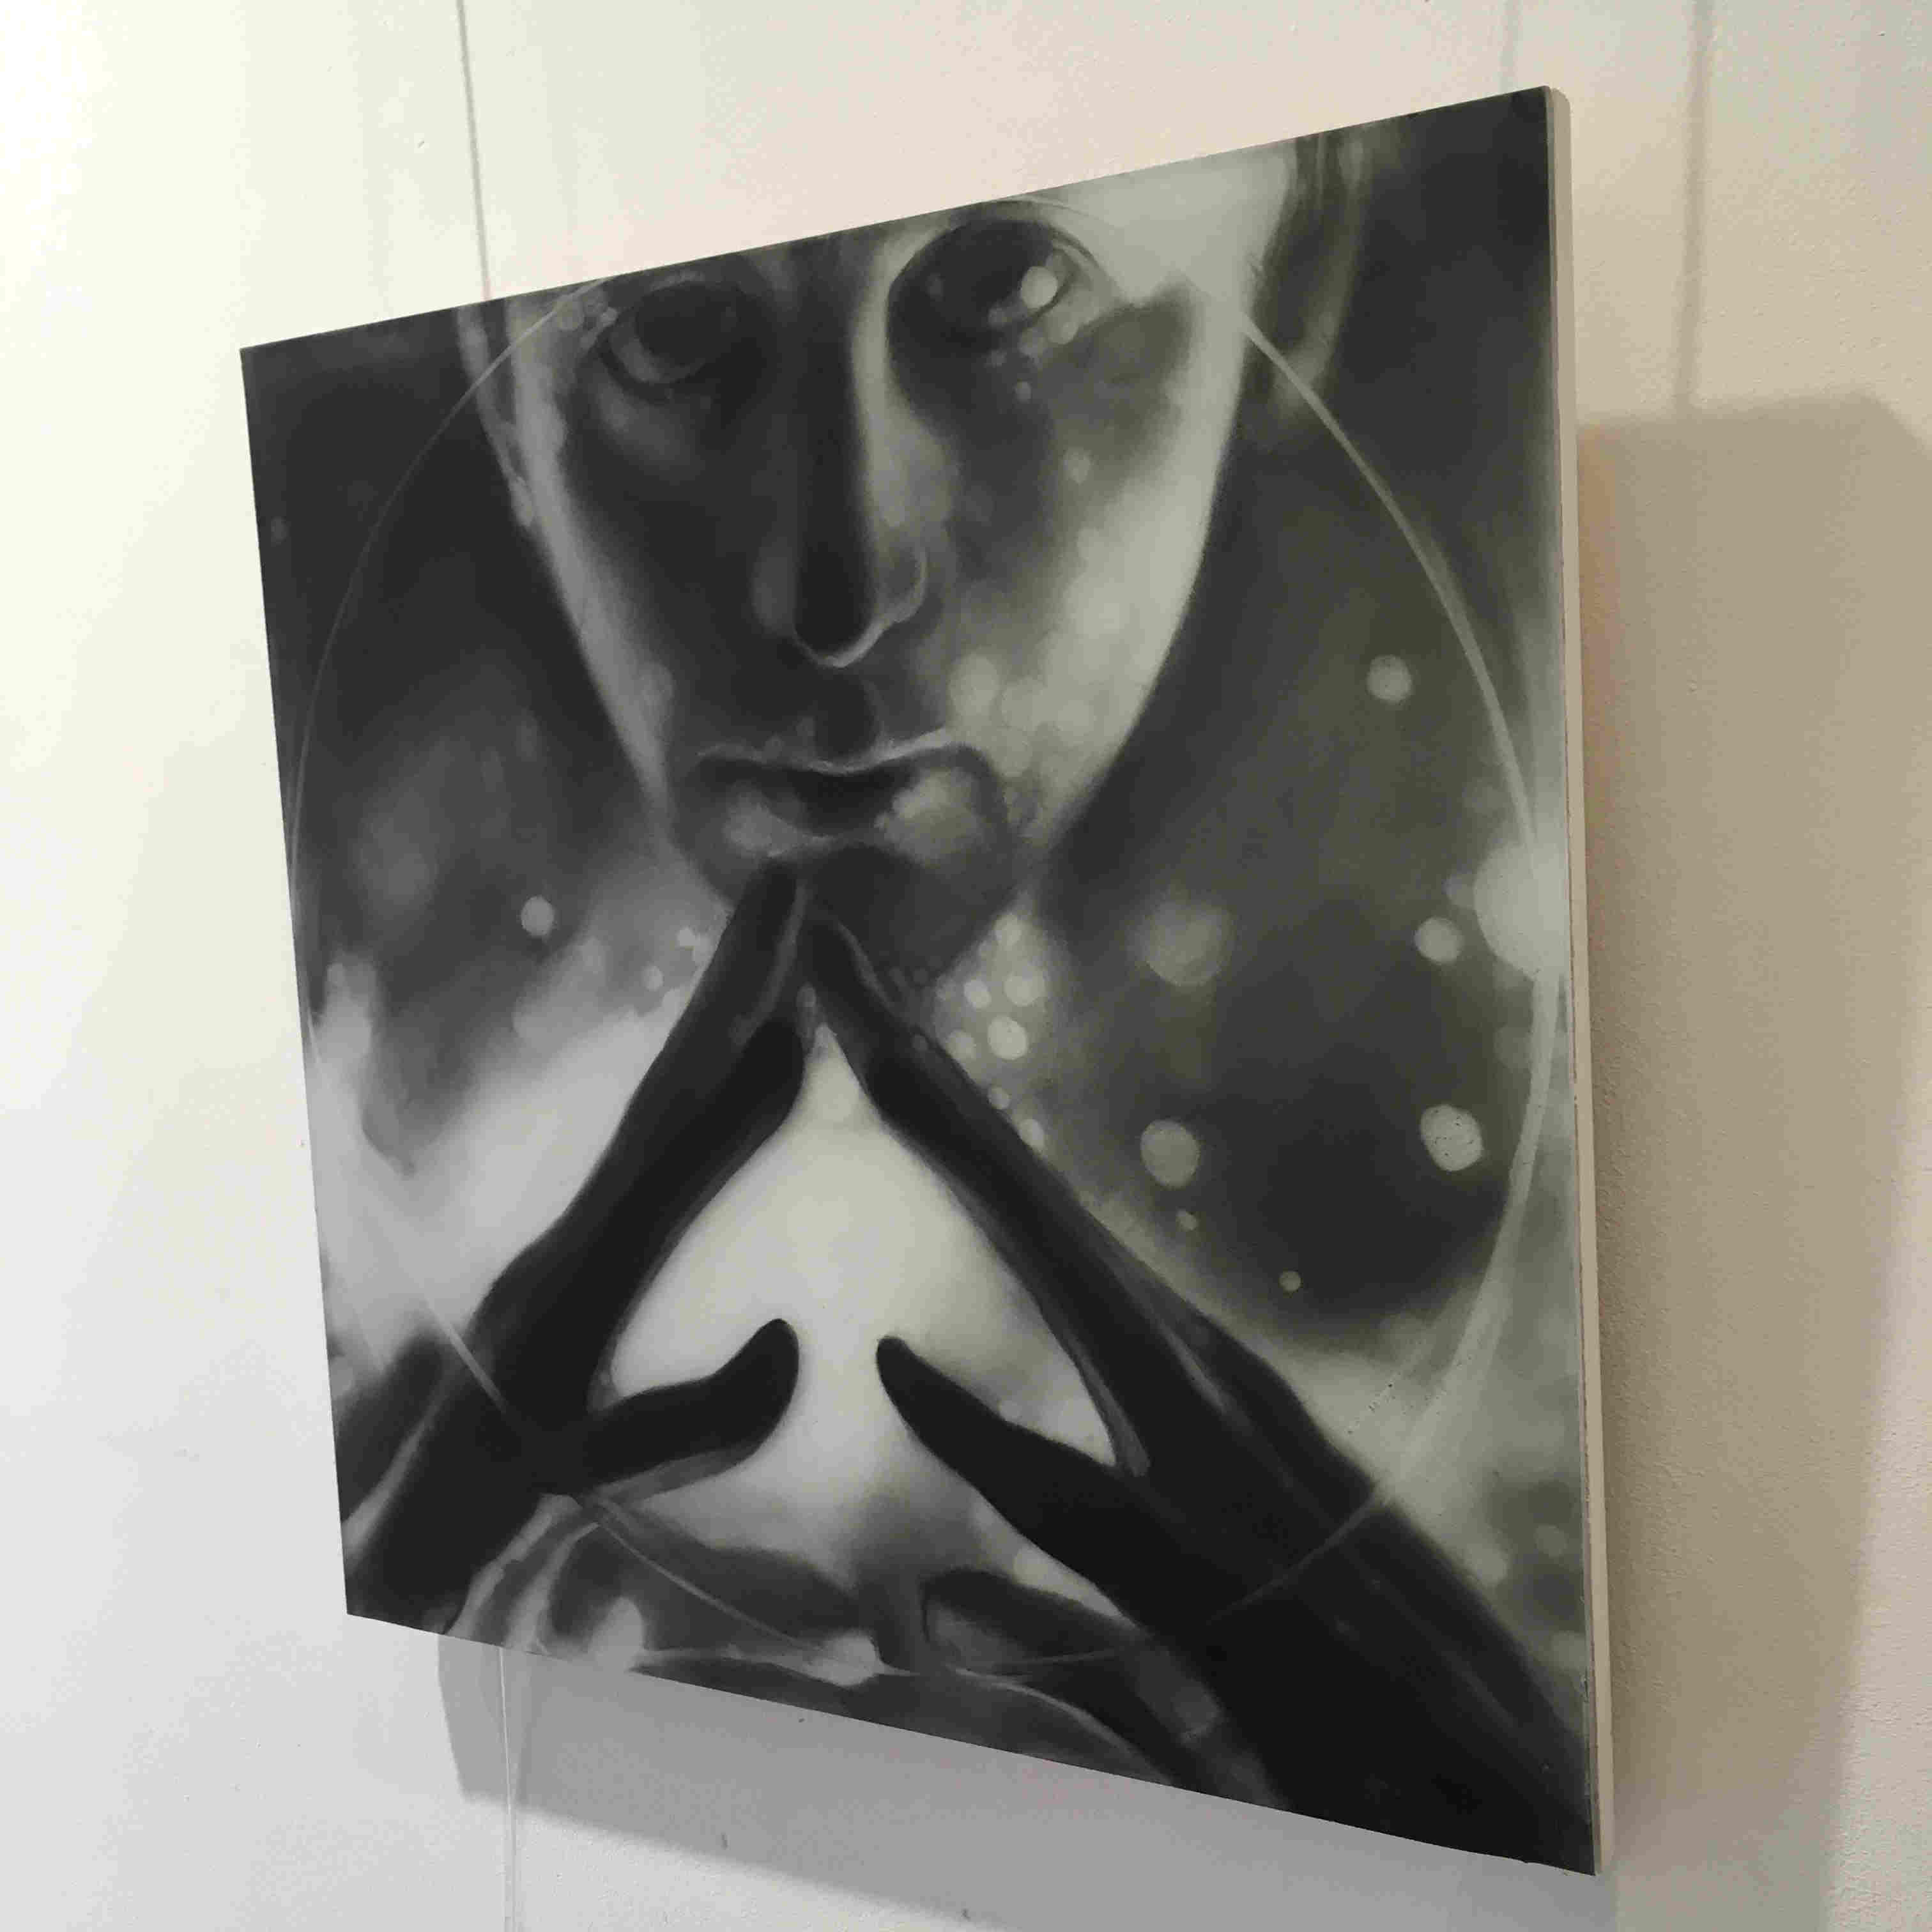 'A New Vision' by artist Ben DaviesJenkins